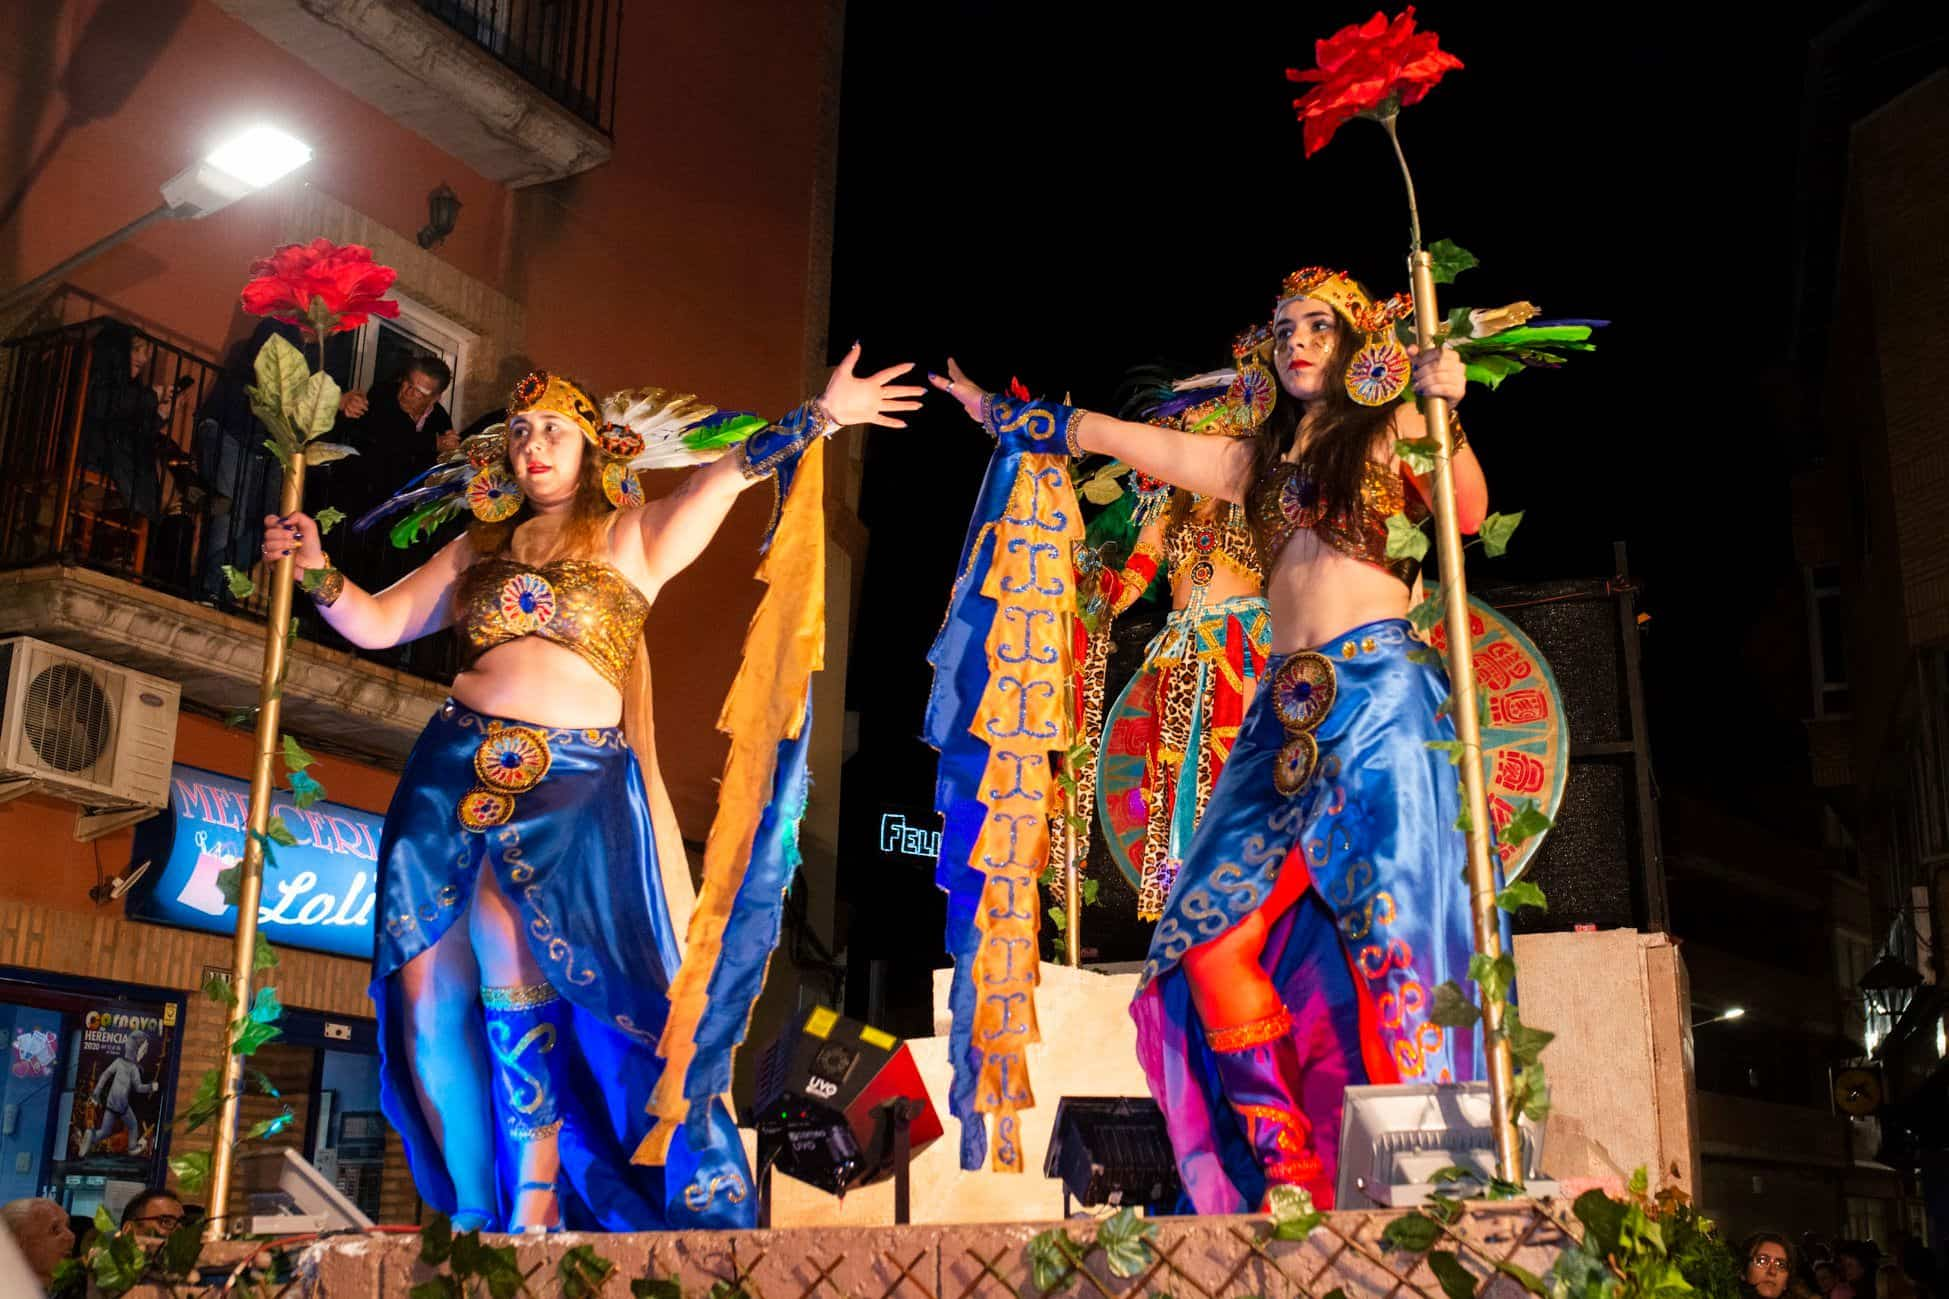 Carnaval de herencia 2020 ofertorio 105 - Selección de fotografías del Ofertorio del Carnaval de Herencia